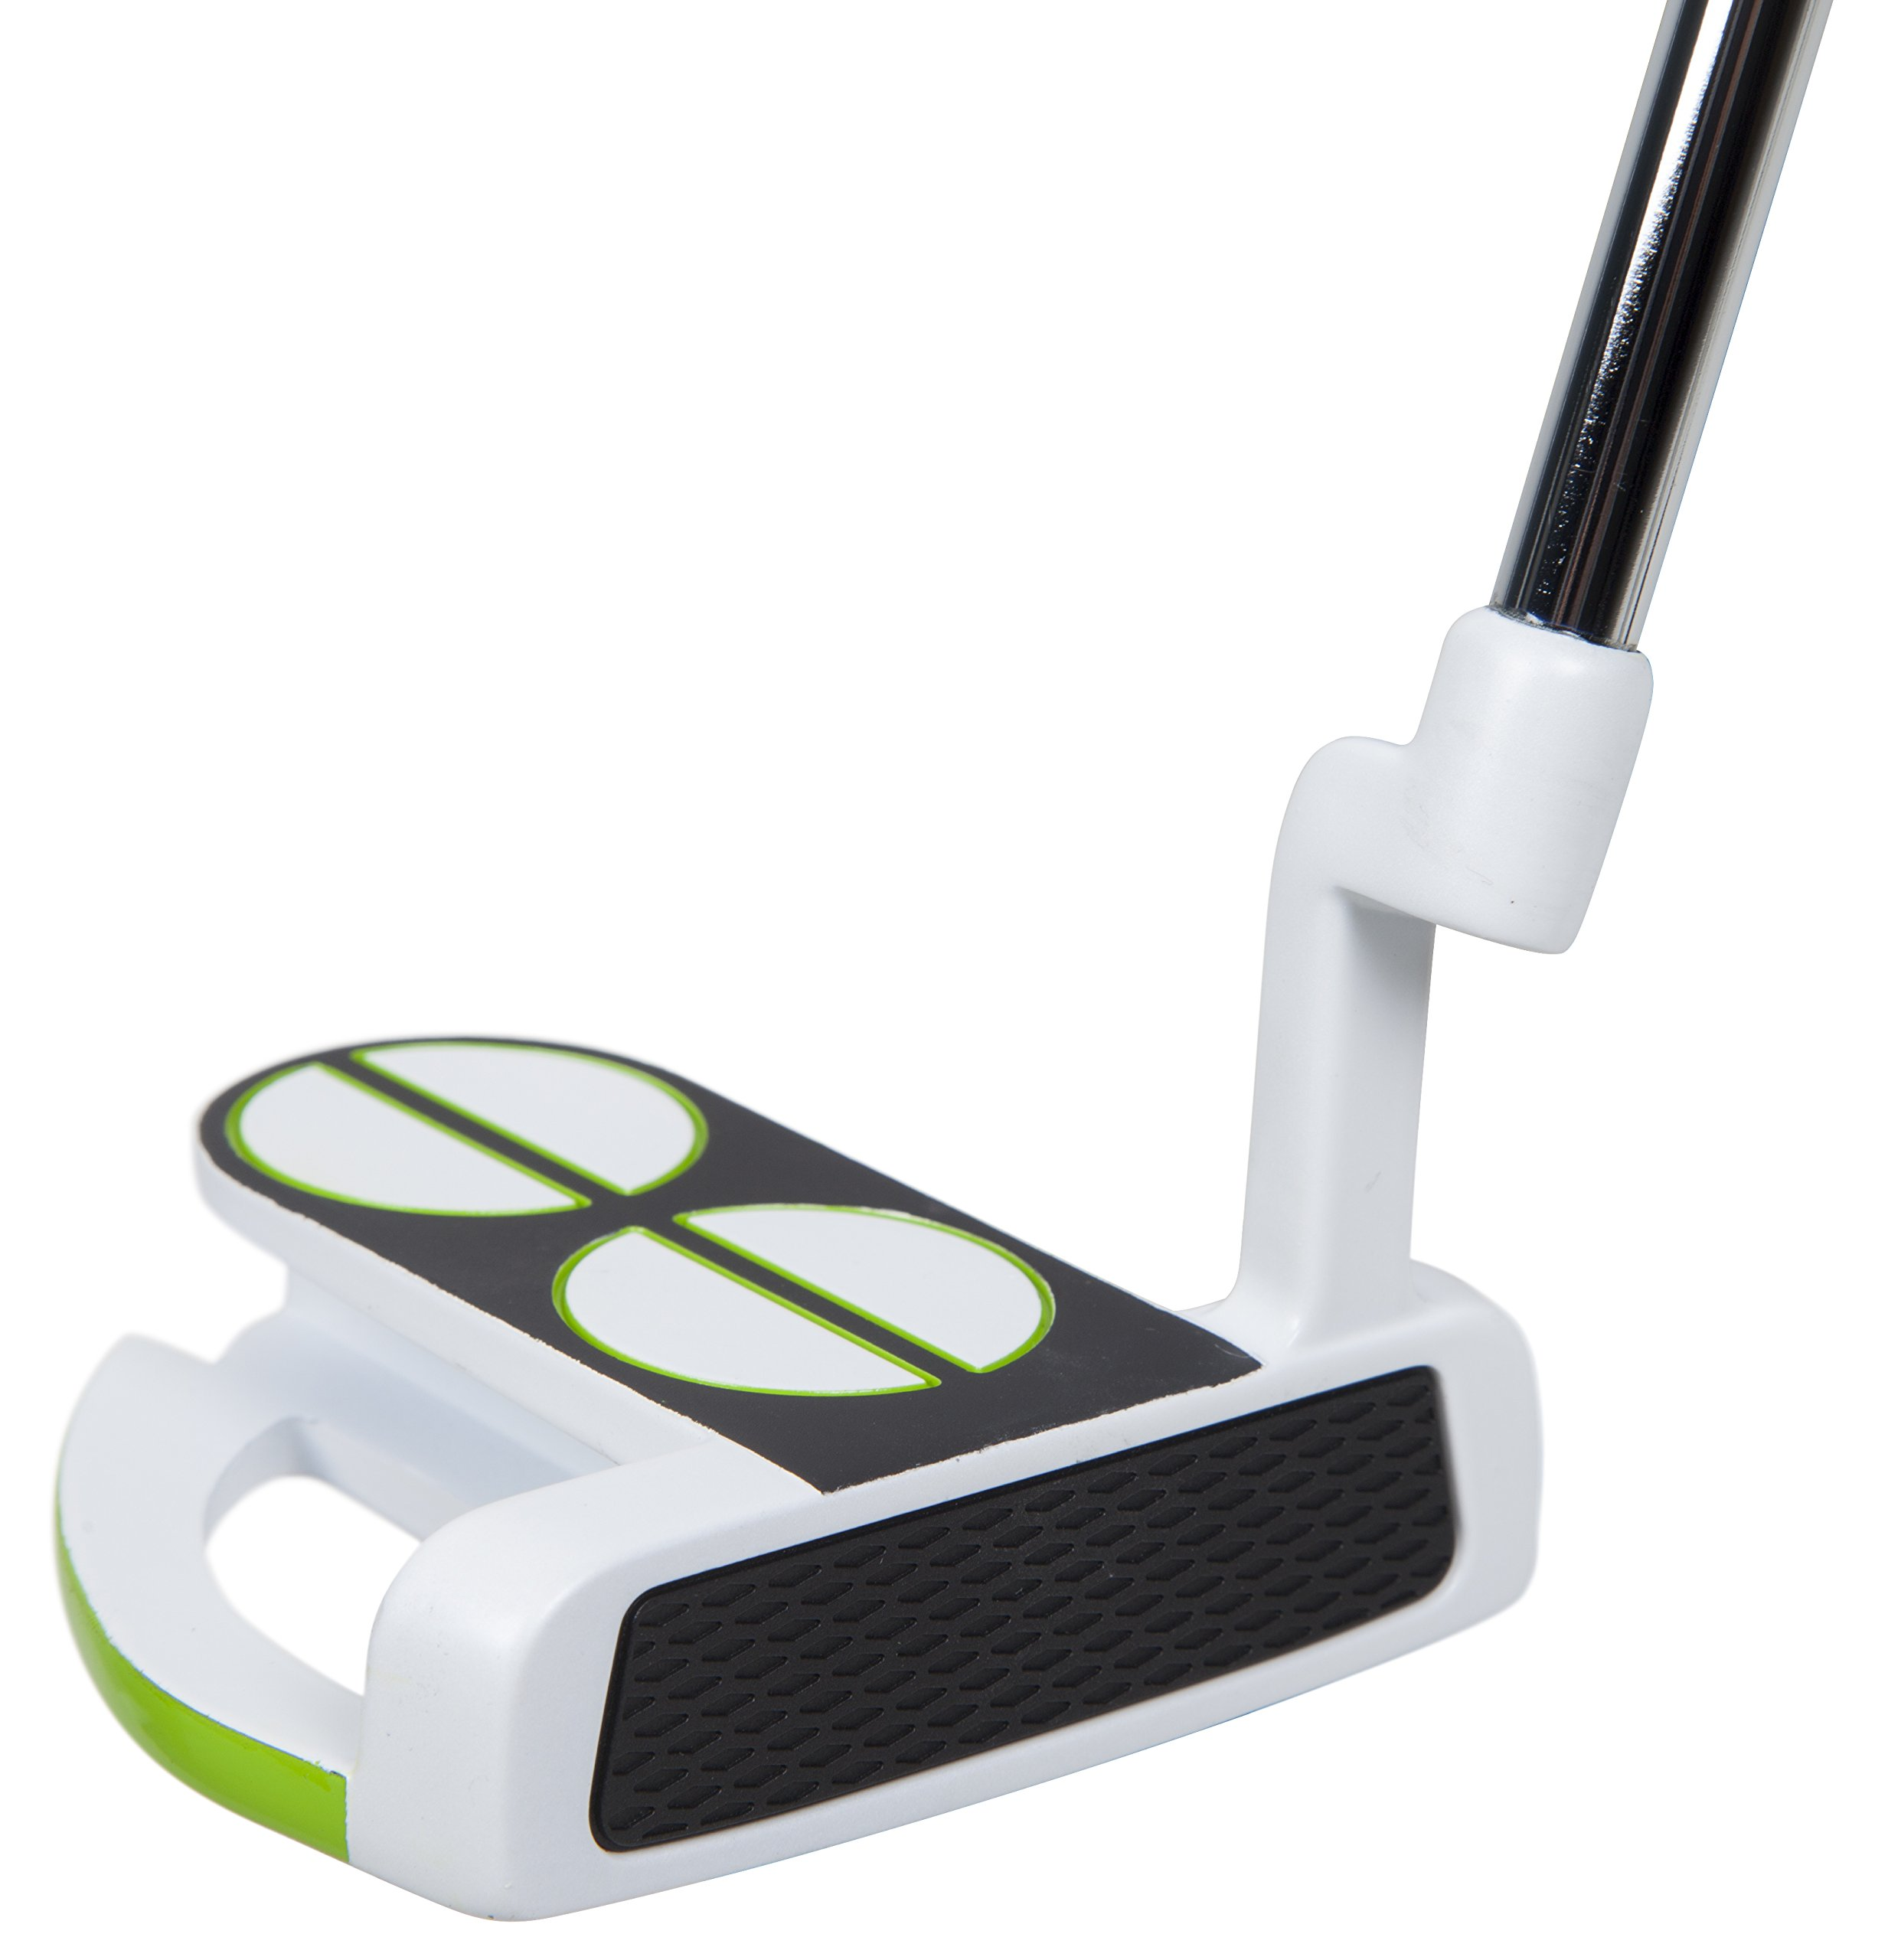 Pinemeadow Golf PGX SL Putter (Men's Right Hand) by Pinemeadow Golf